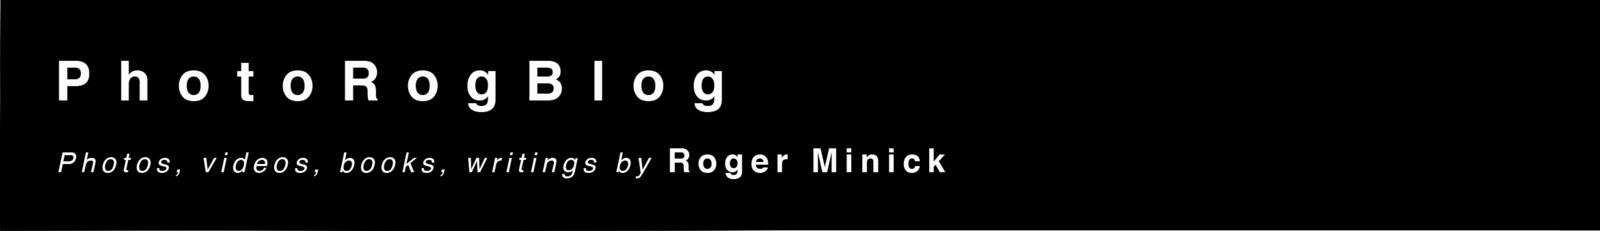 PhotoRogBlog